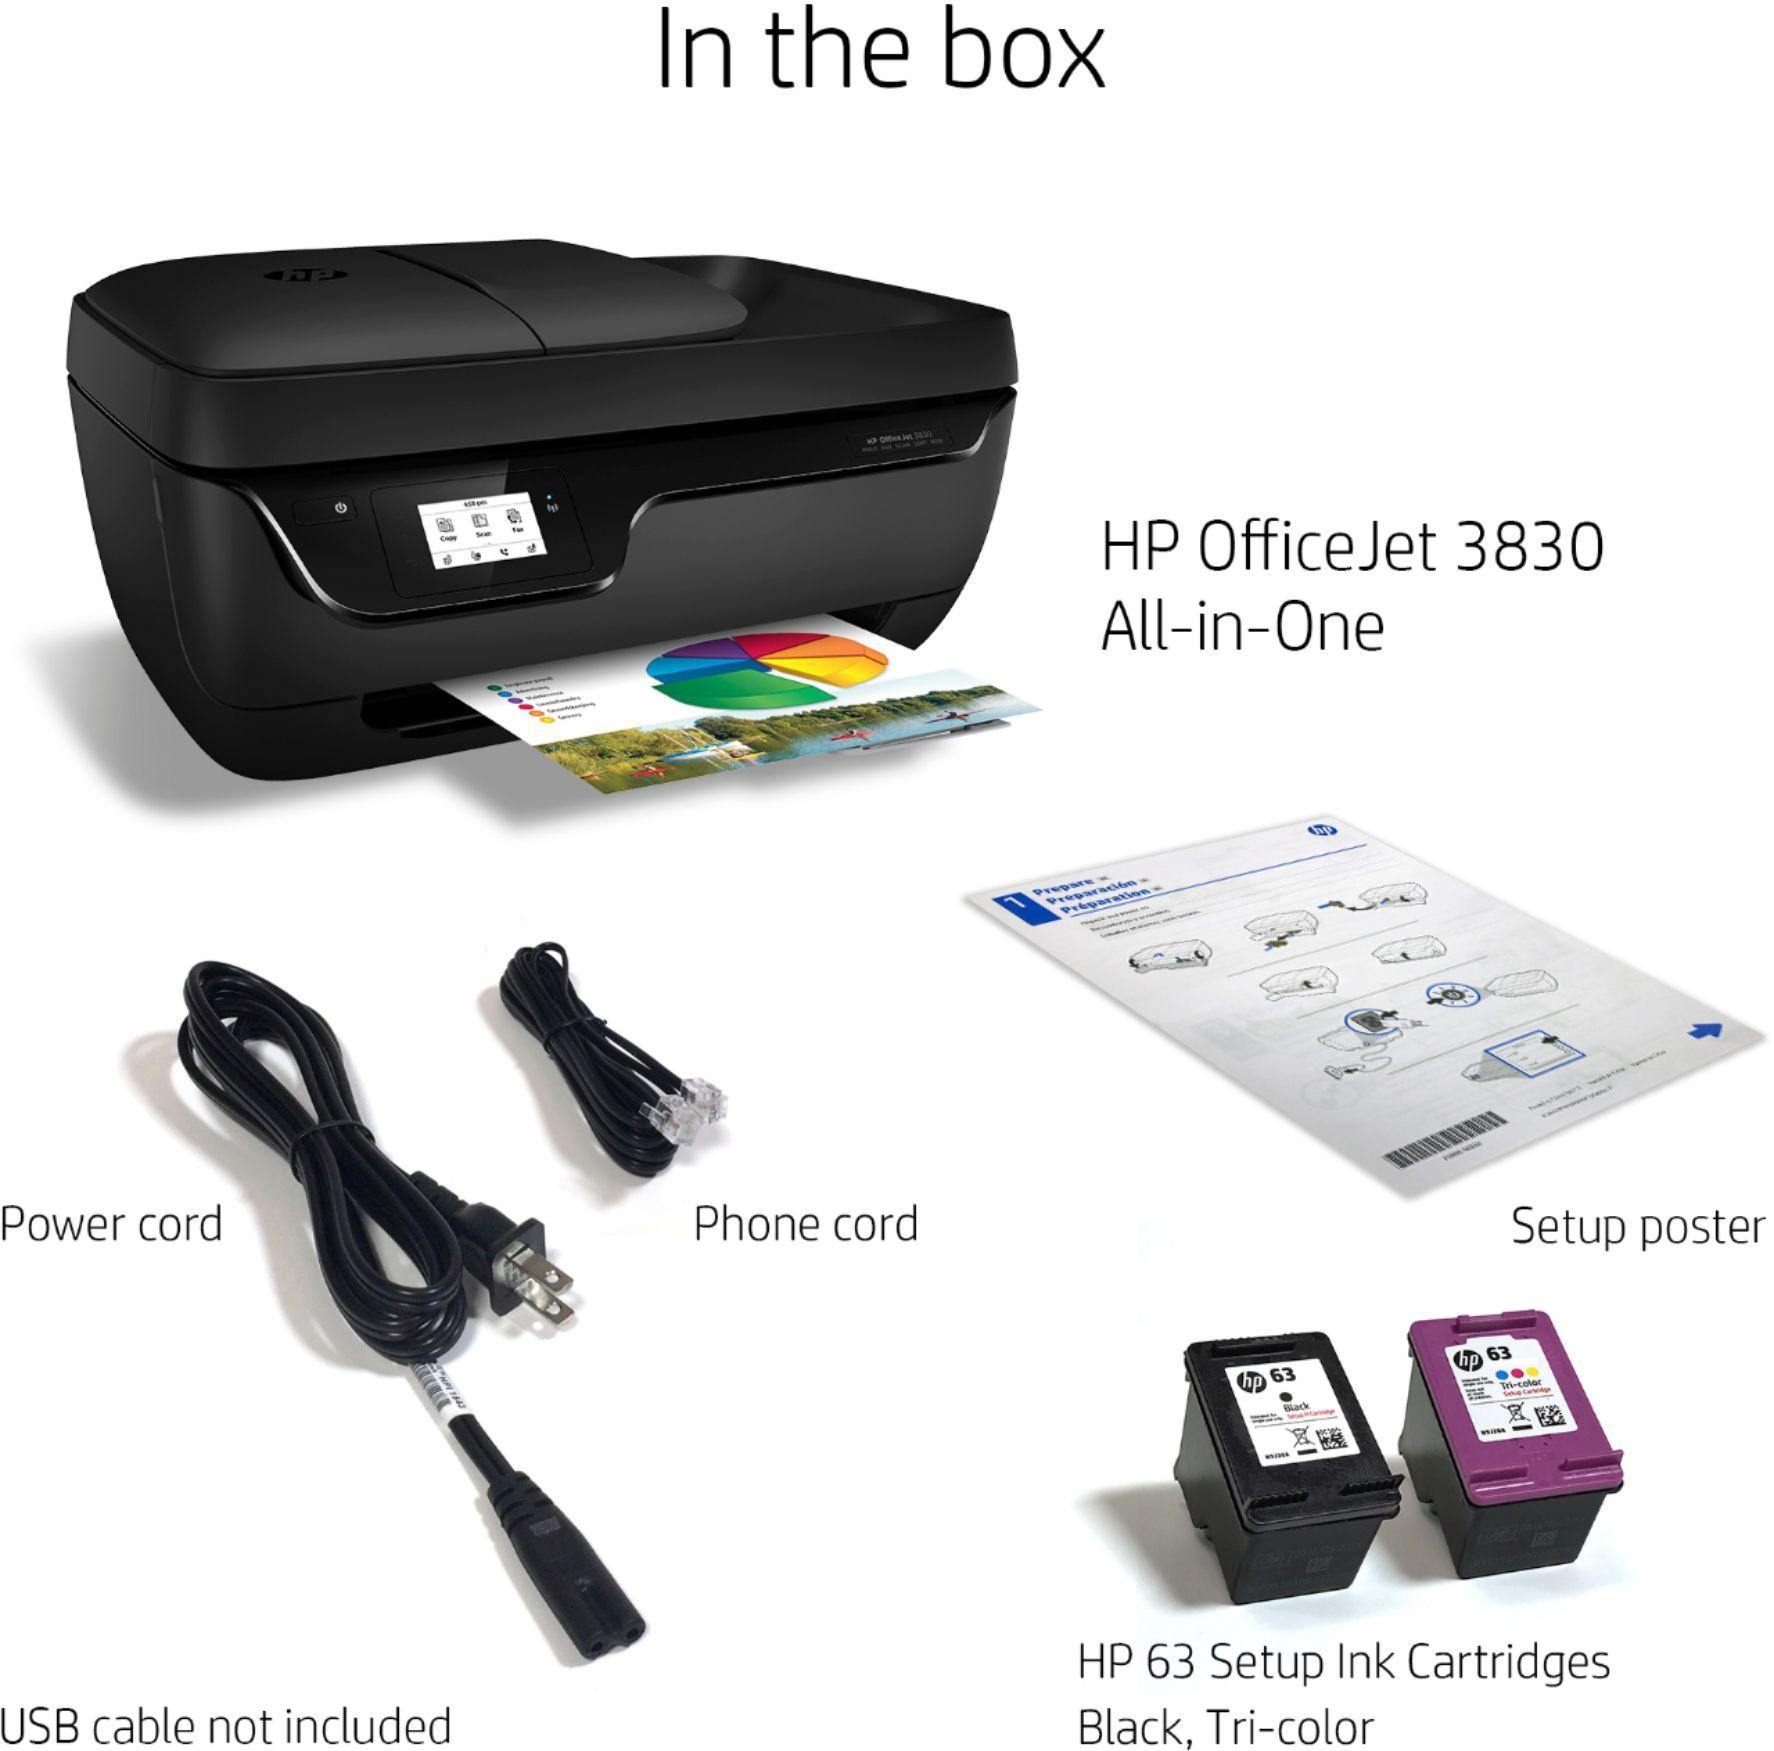 HP OfficeJet 3830 dentro de la caja